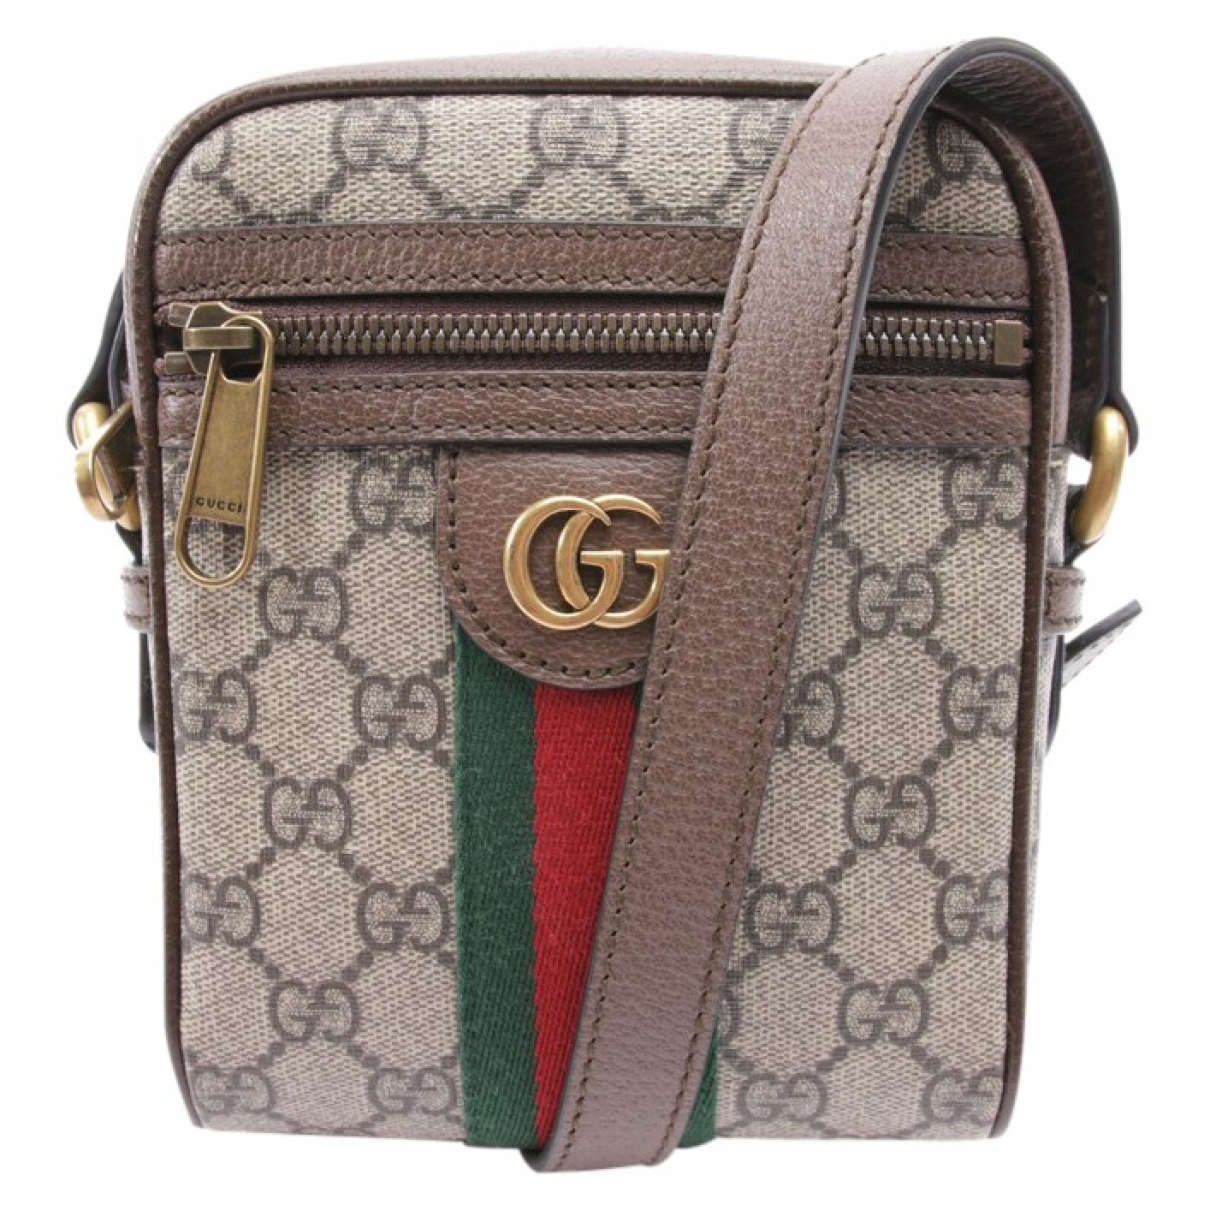 Gucci Ophidia Handtasche in  Bunt Baumwolle